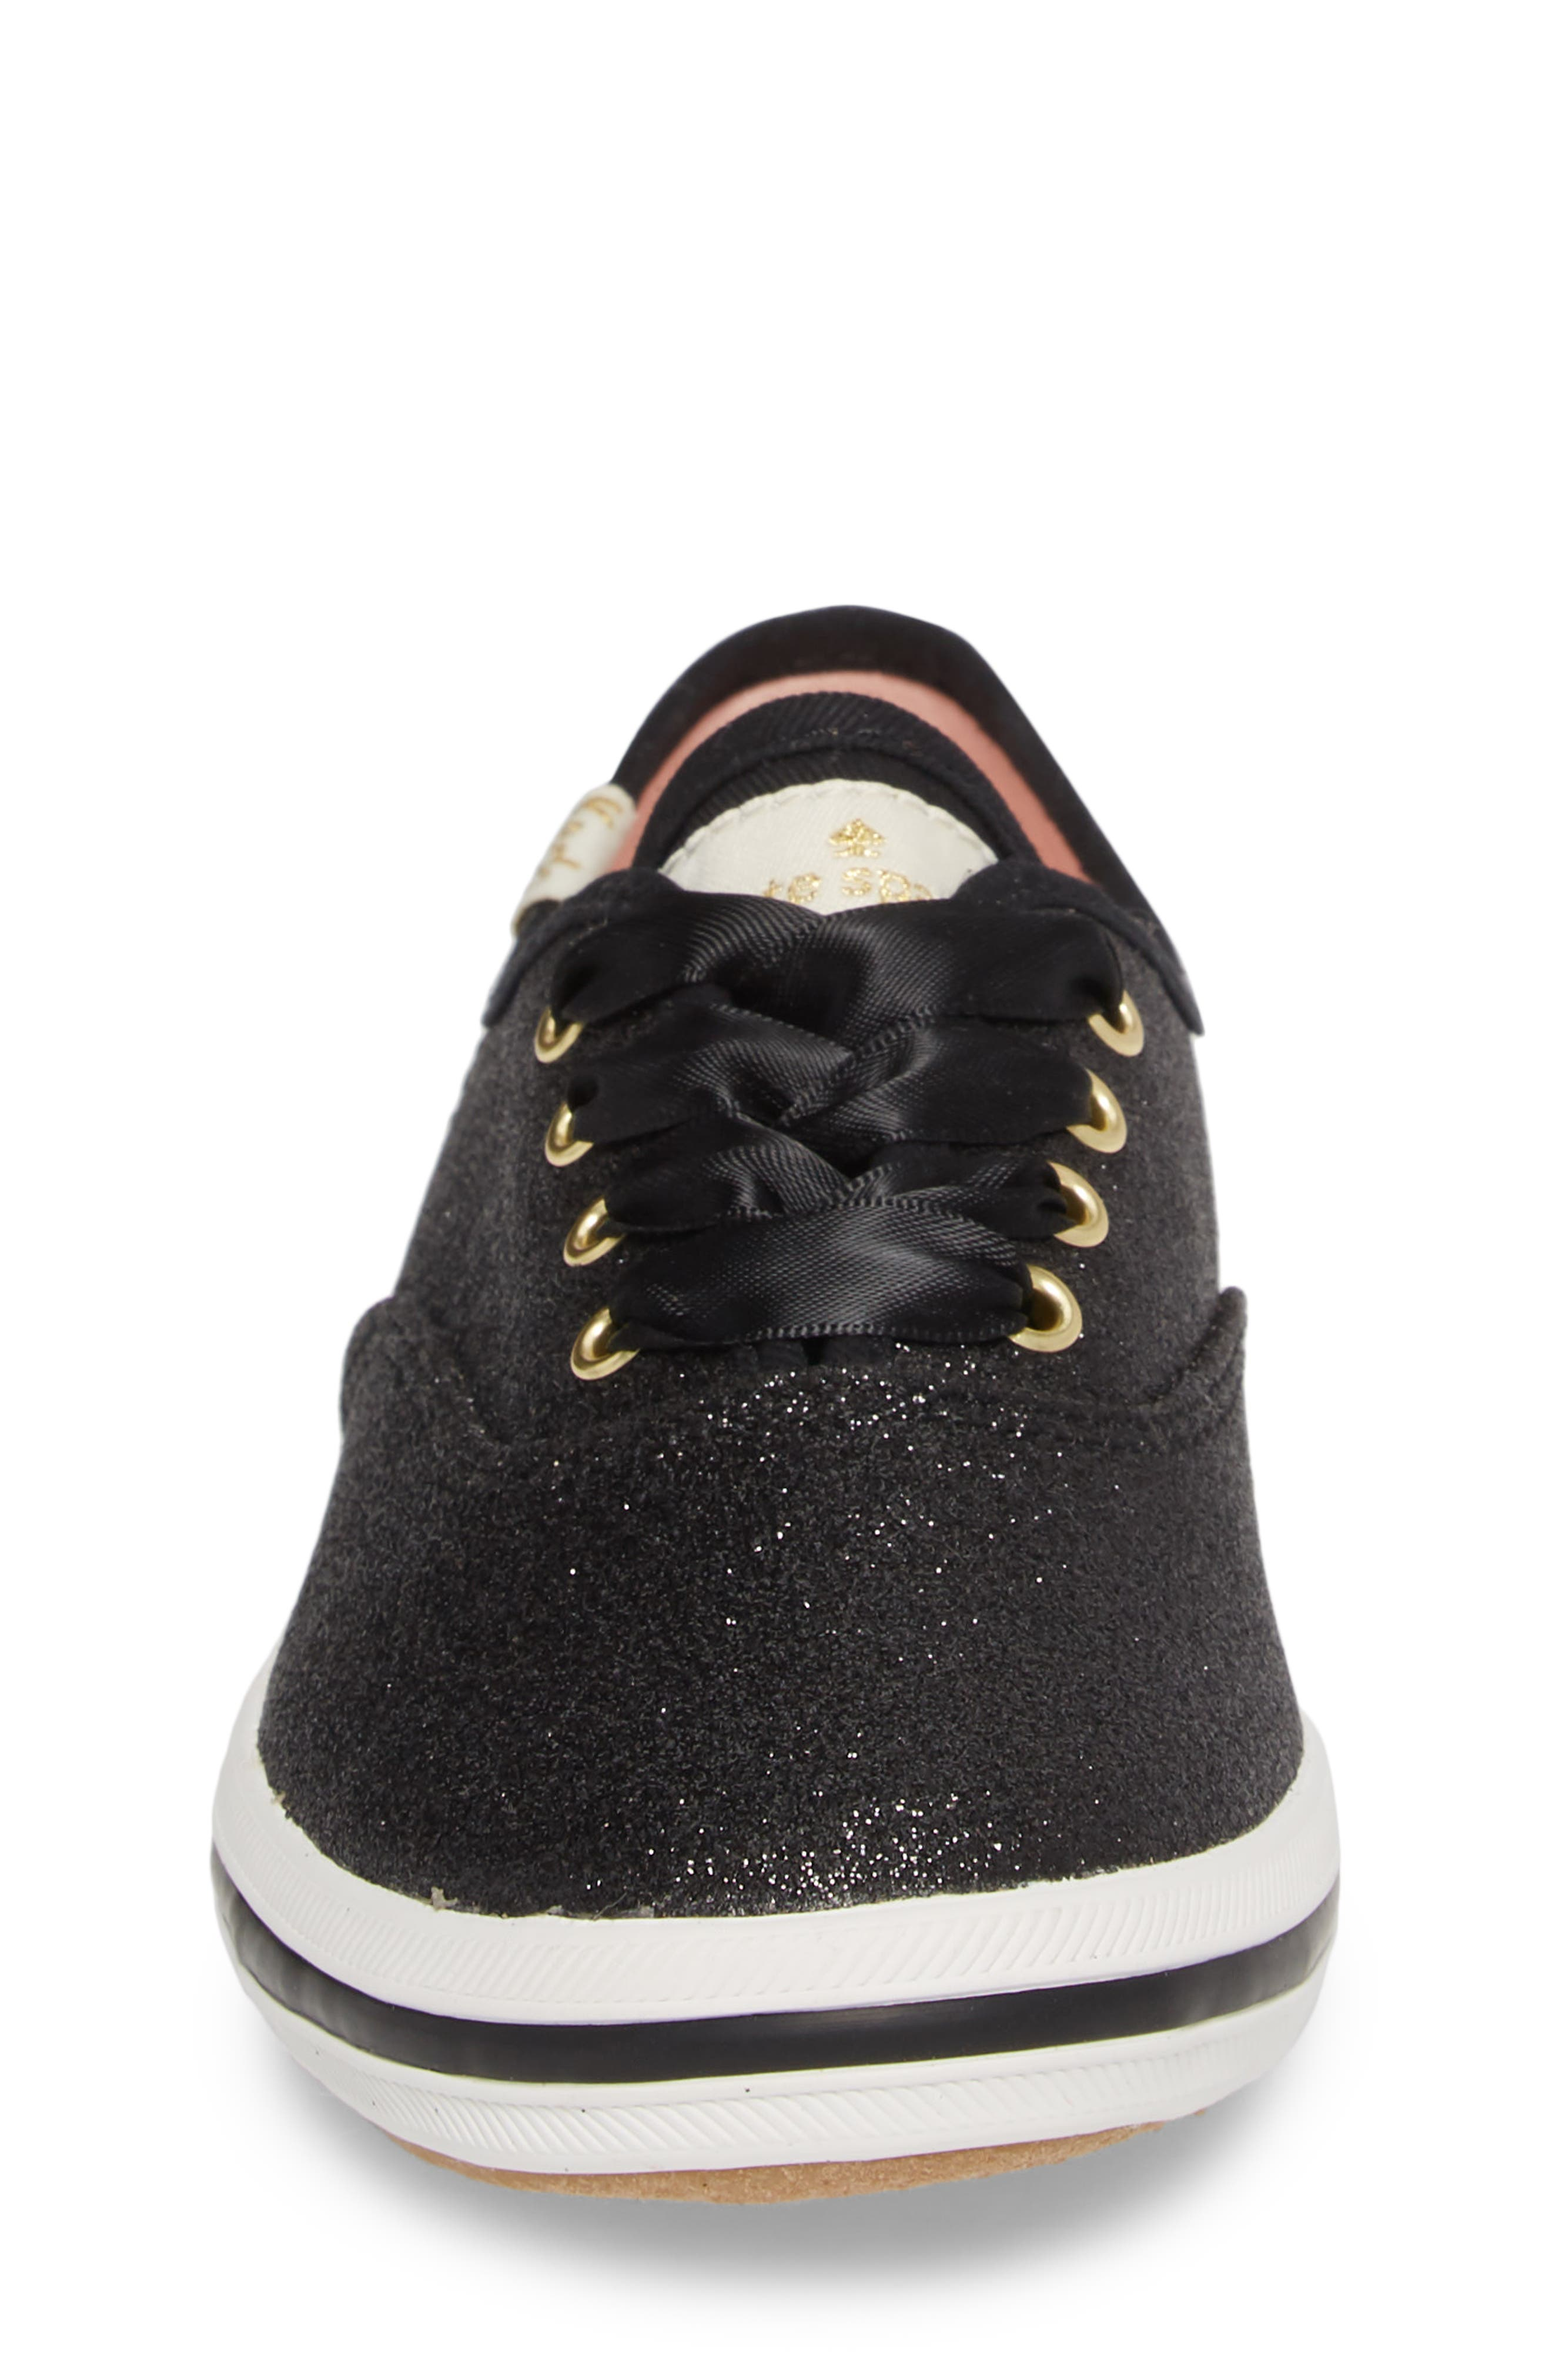 x kate spade new york Champion Glitter Sneaker,                             Alternate thumbnail 5, color,                             Black